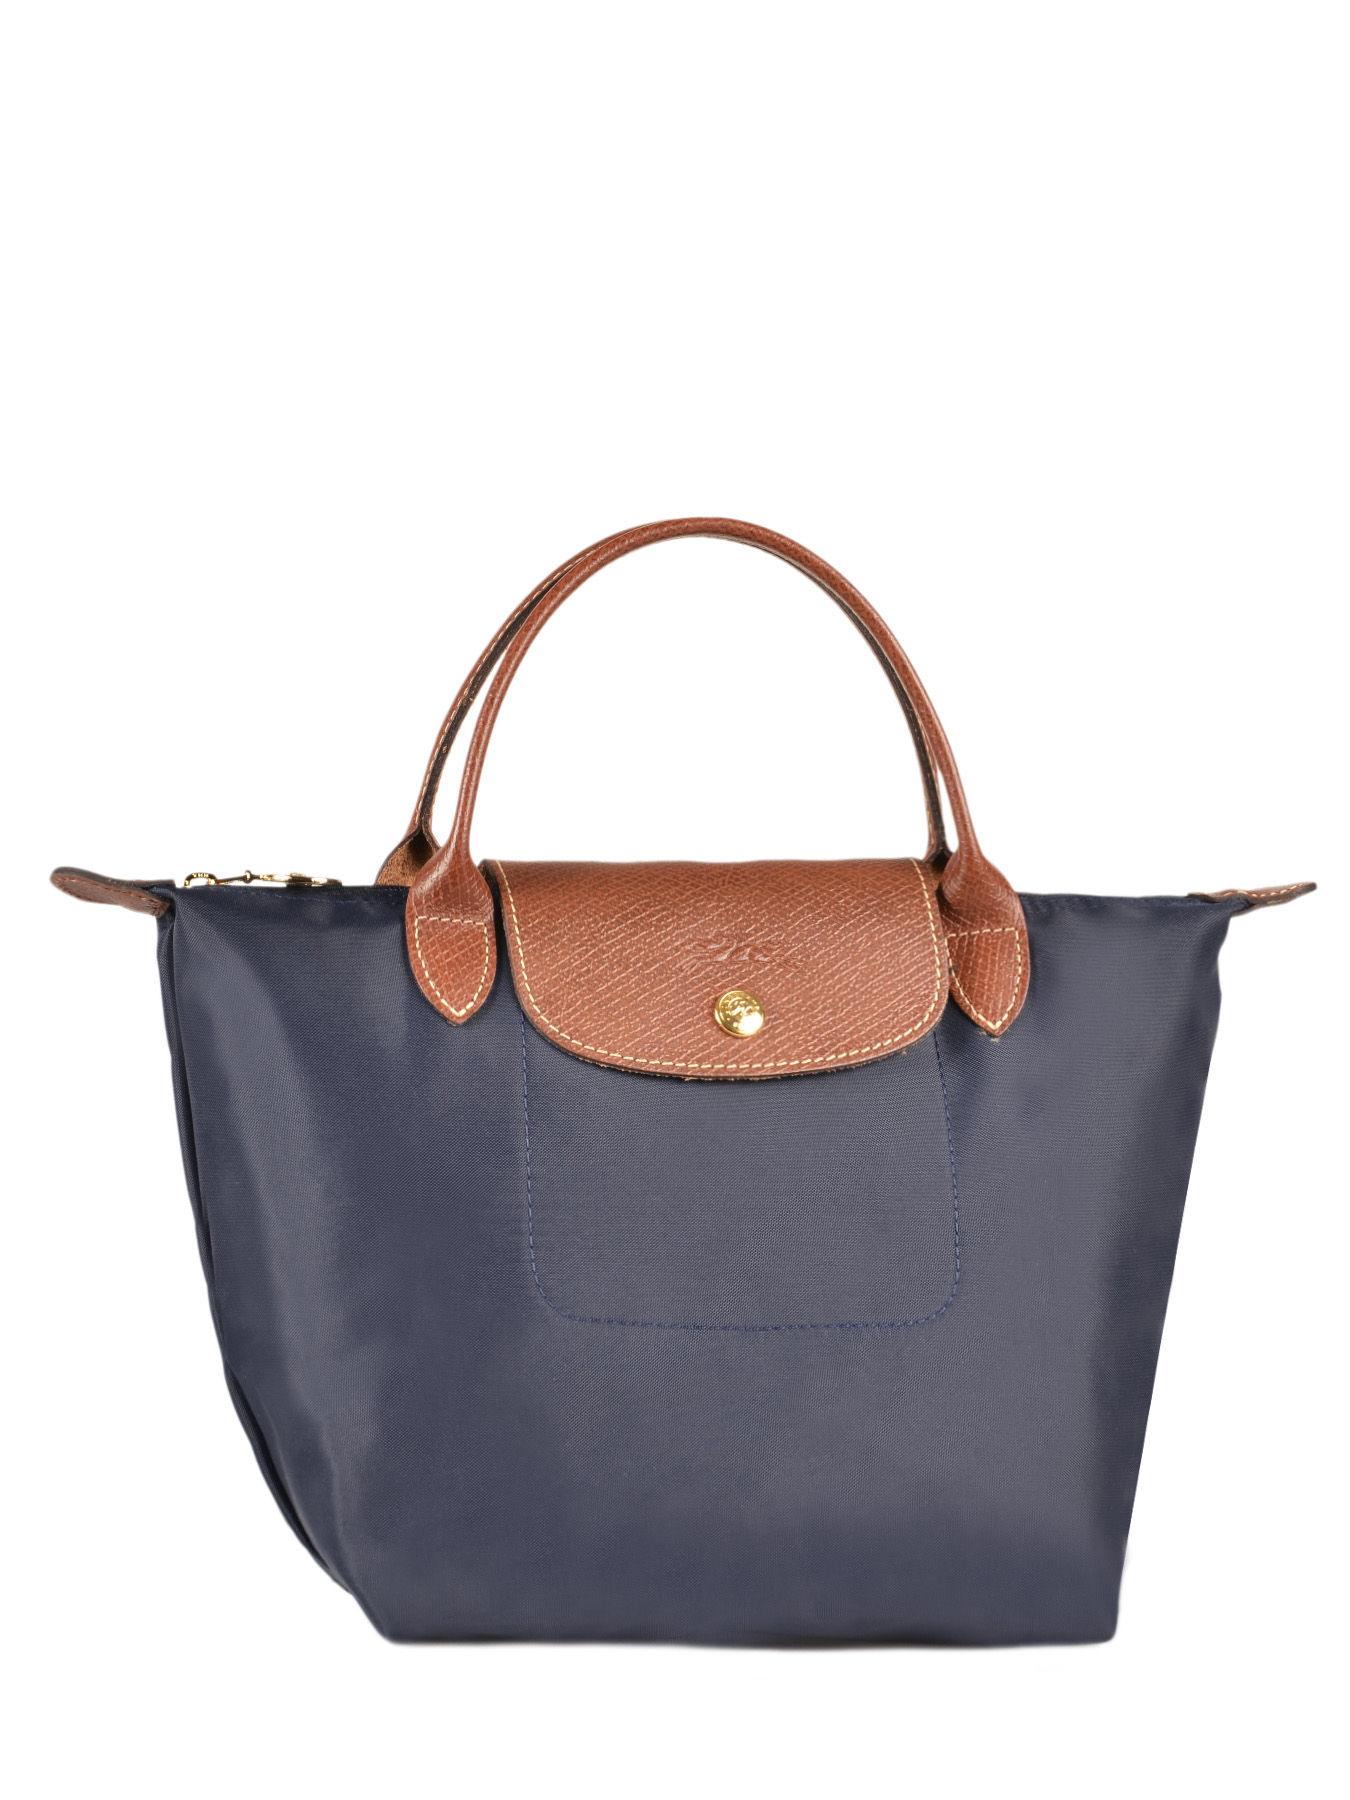 sac longchamp taille s